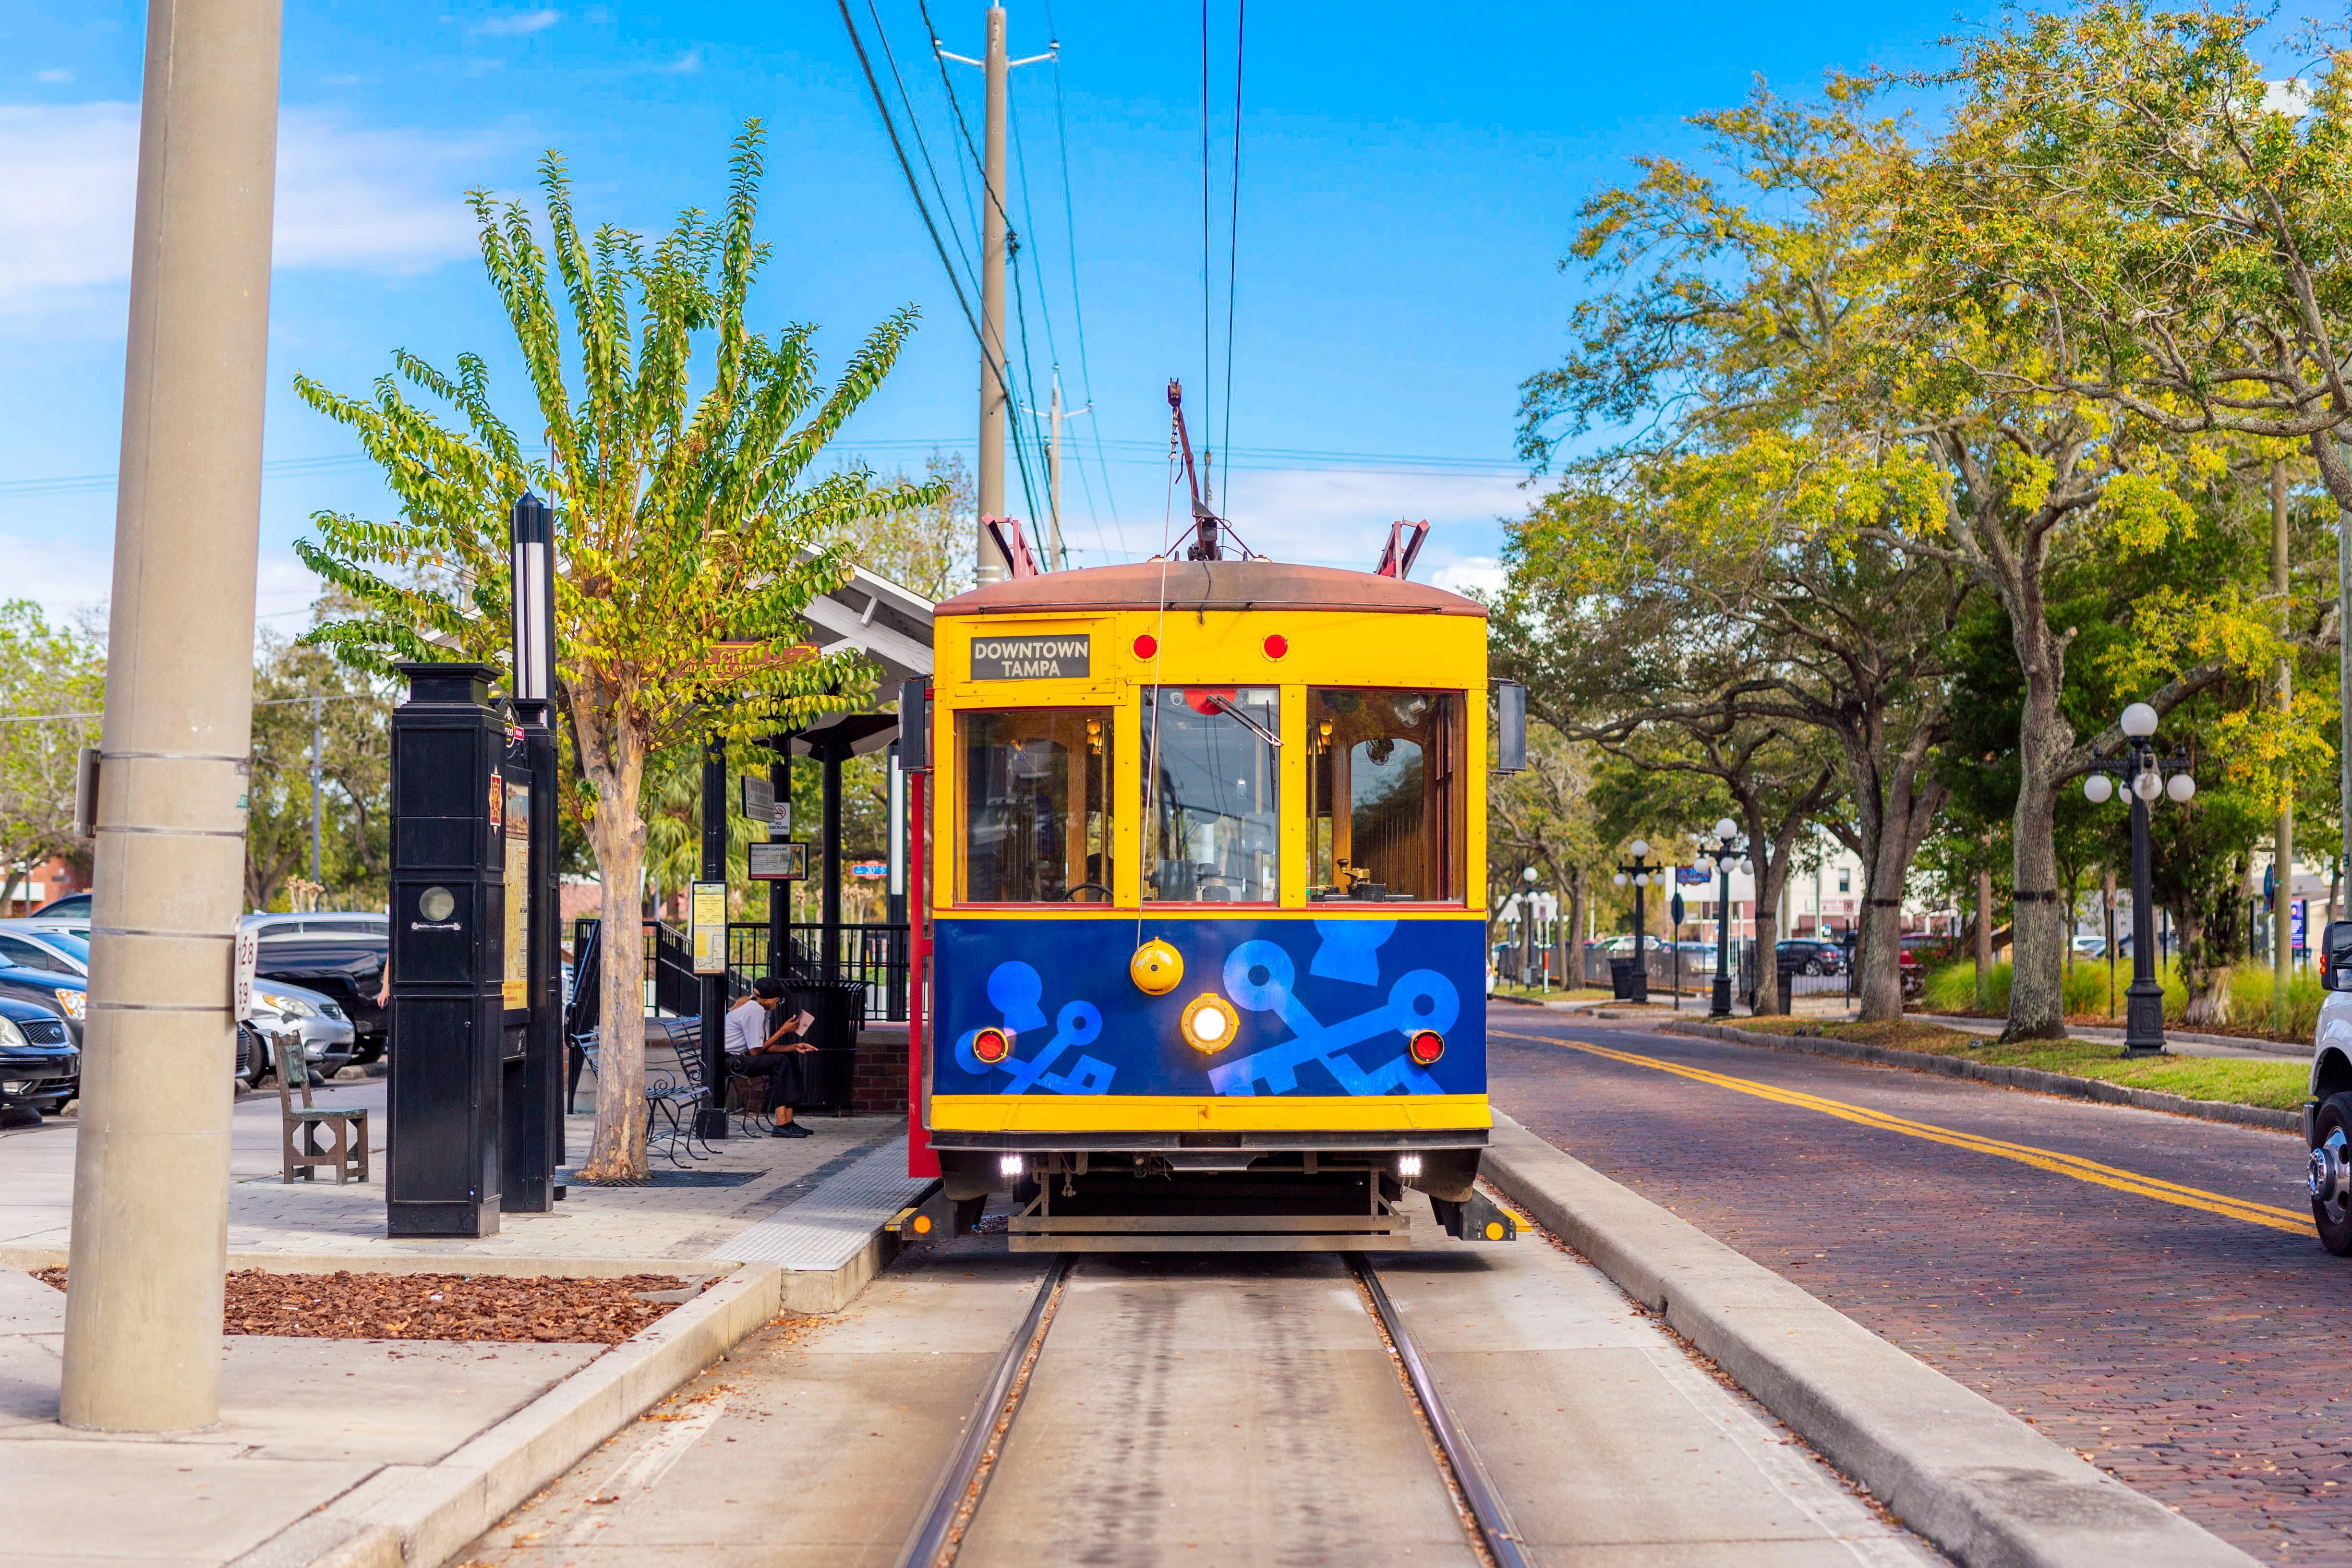 TECO Line Street Car (Fun Things to do in Tampa)